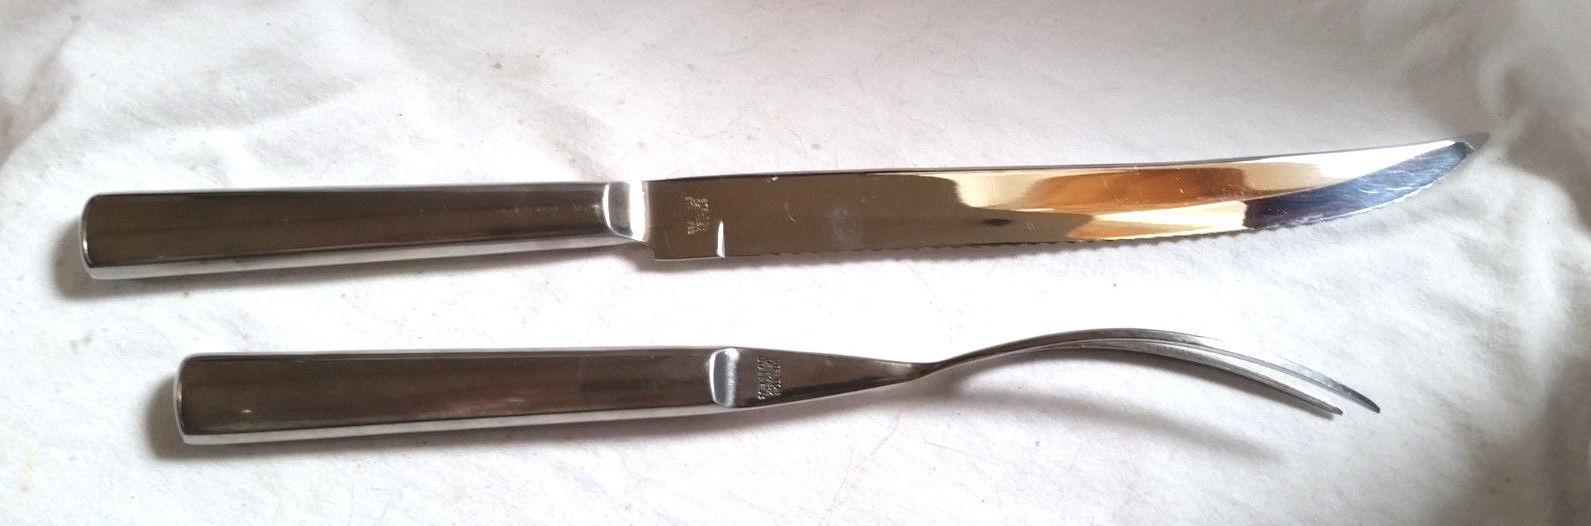 2 pc STELTON Stainless Steel Danish Carving Set, 14